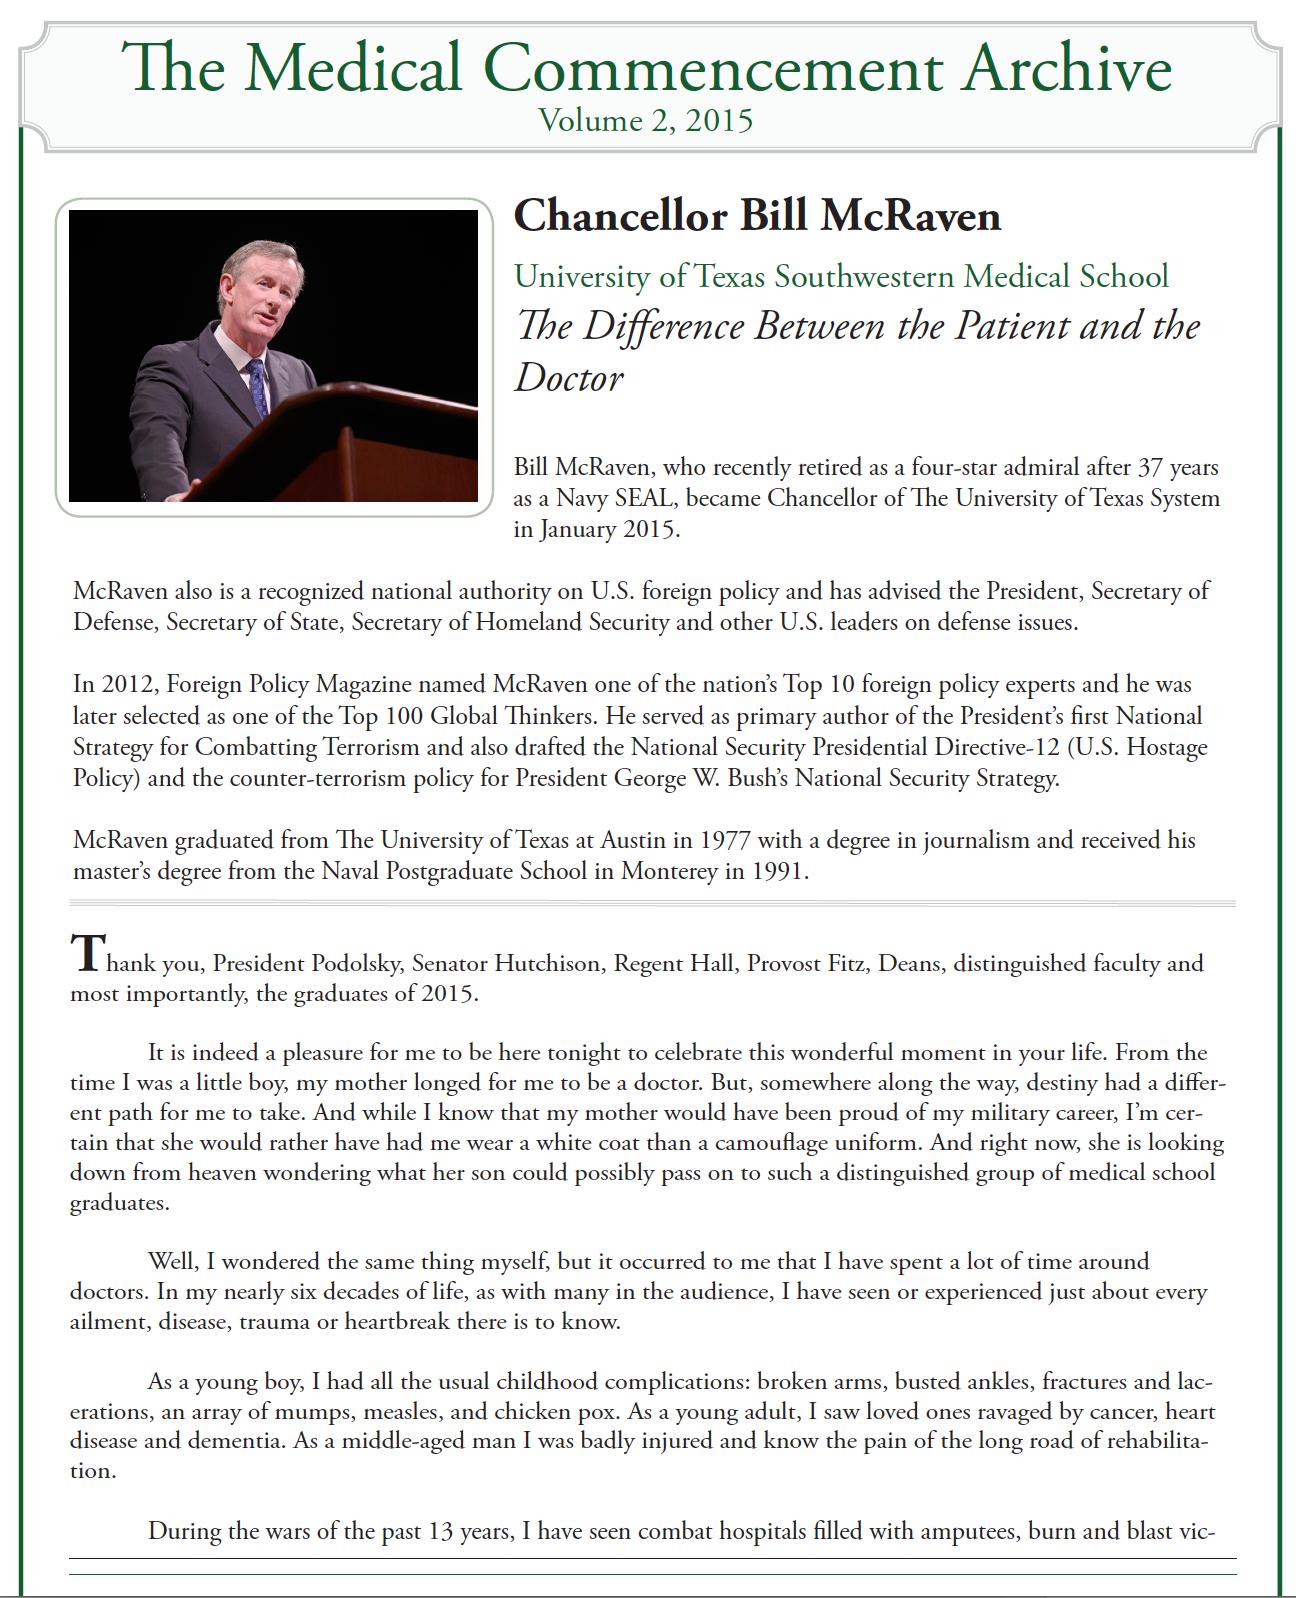 mcraven commencement speech